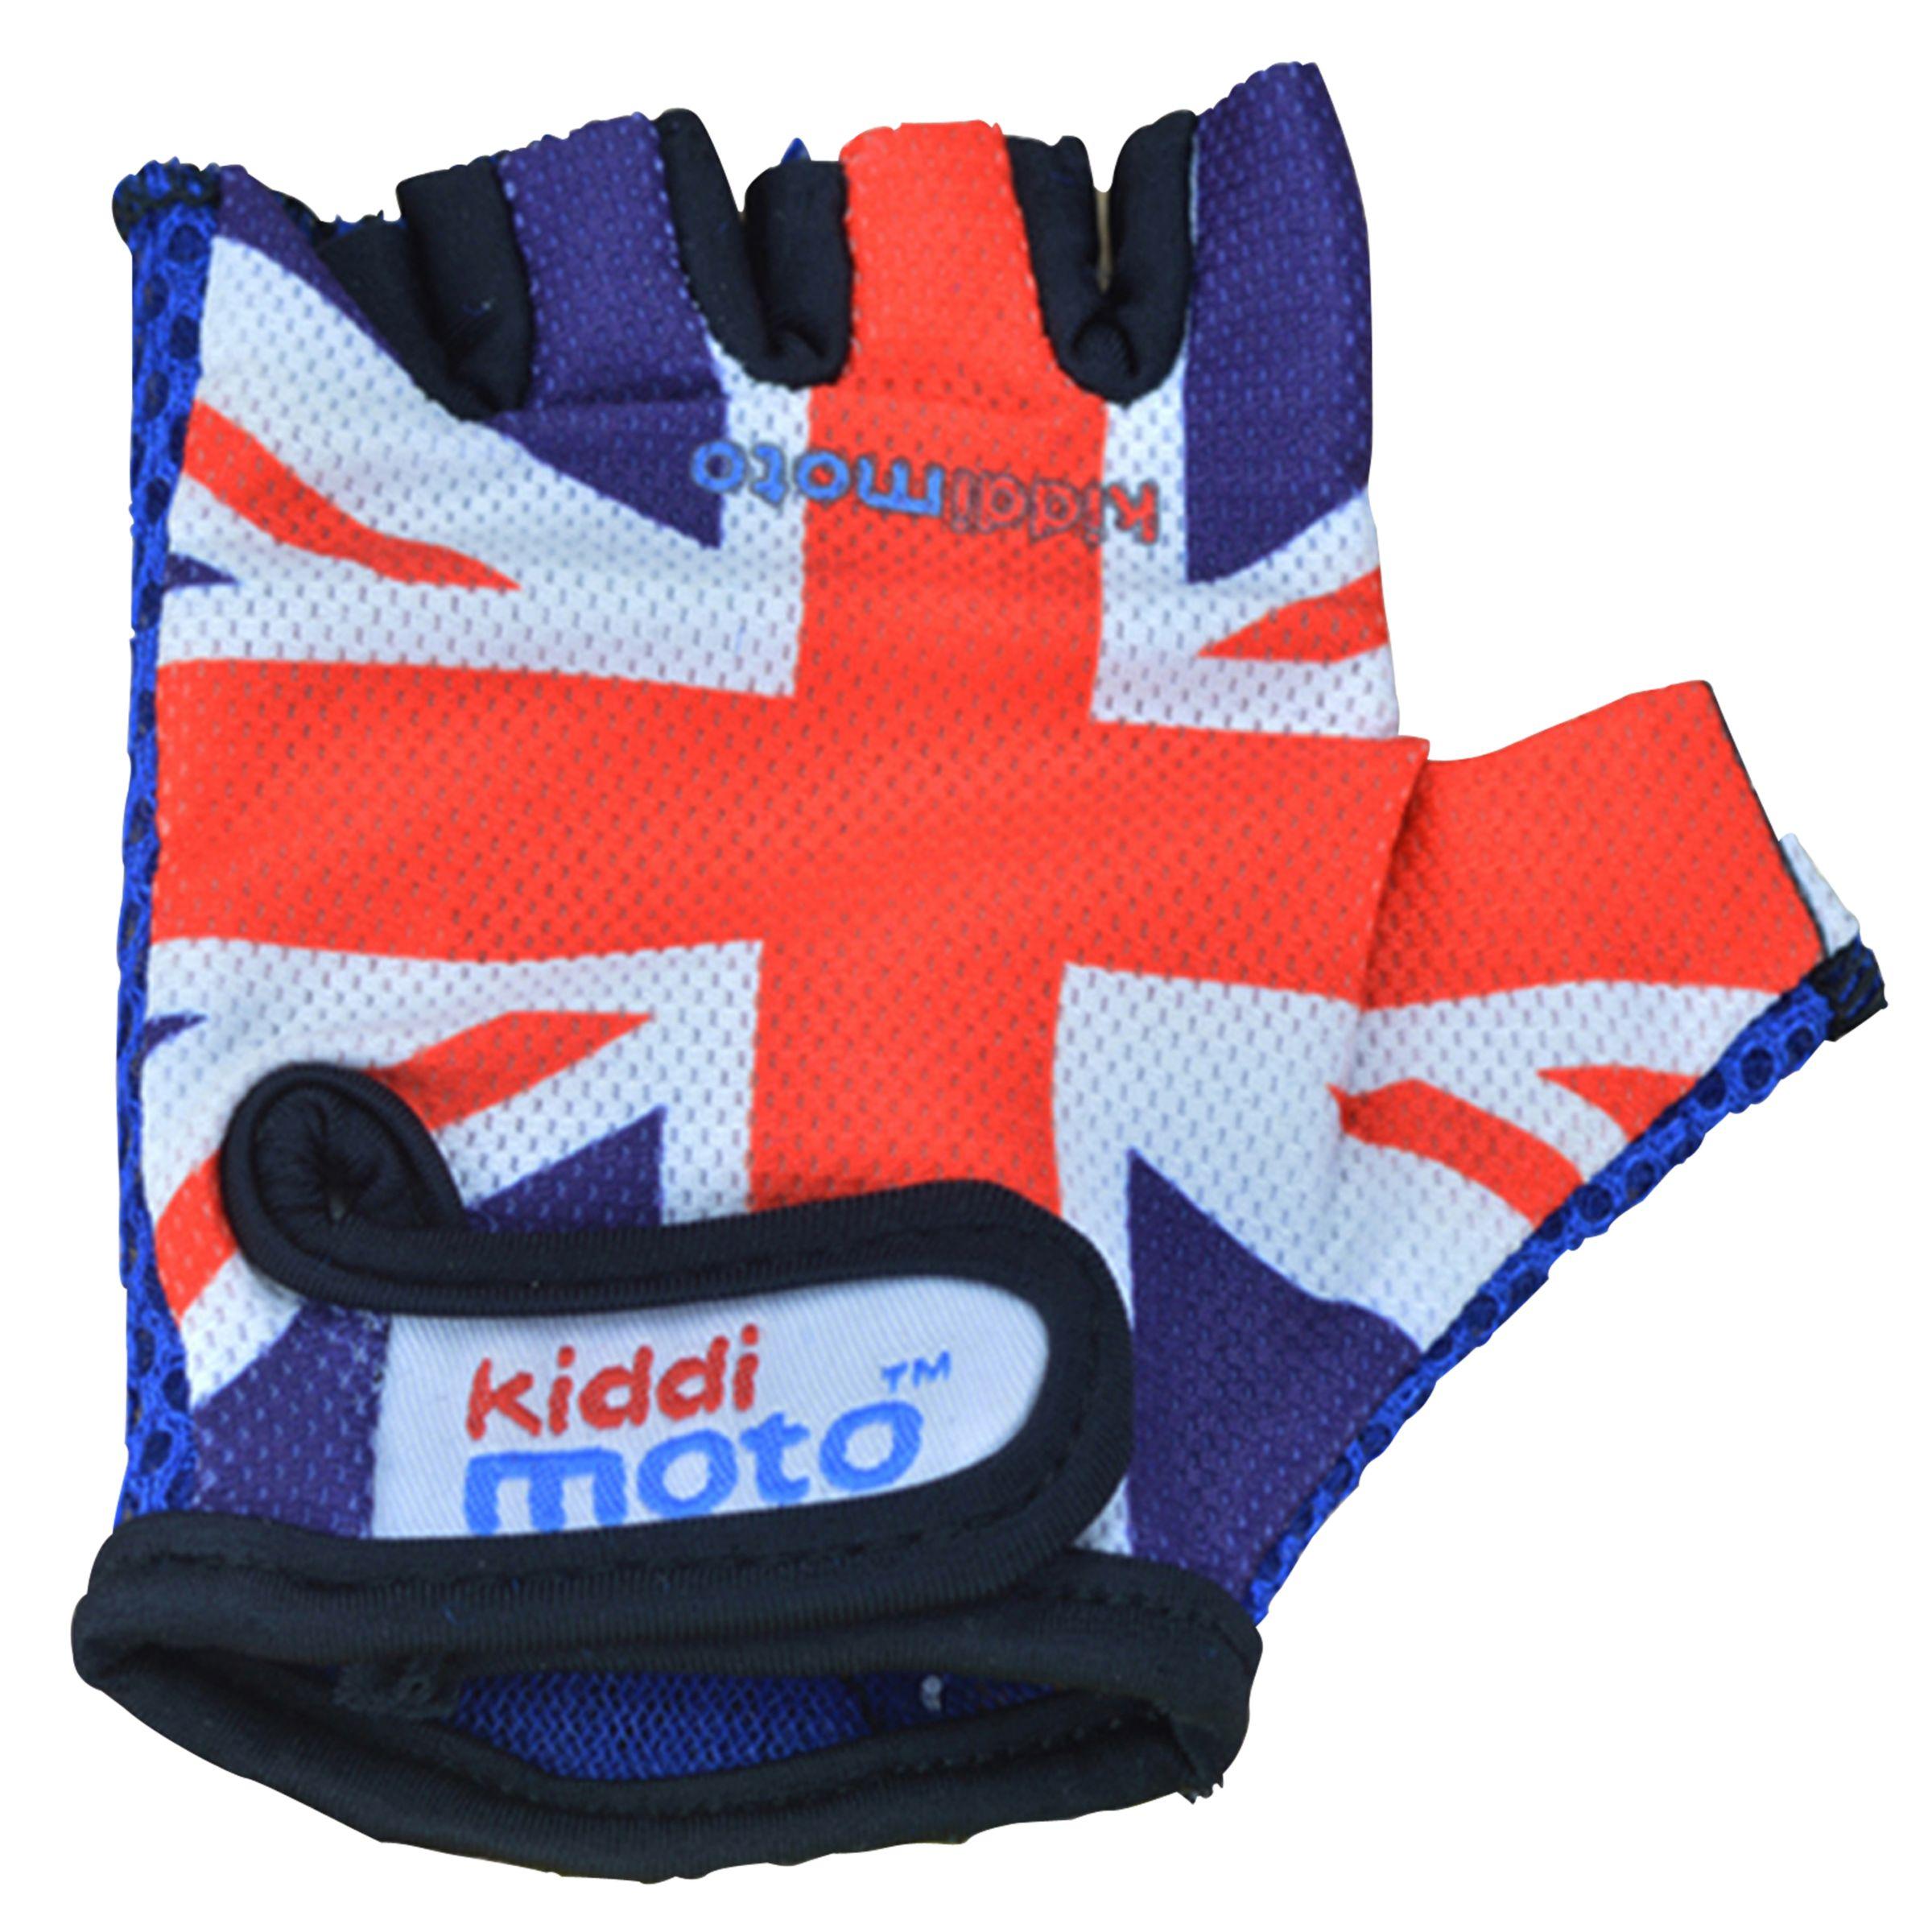 Kiddimoto Kiddimoto Gloves, Red, Small